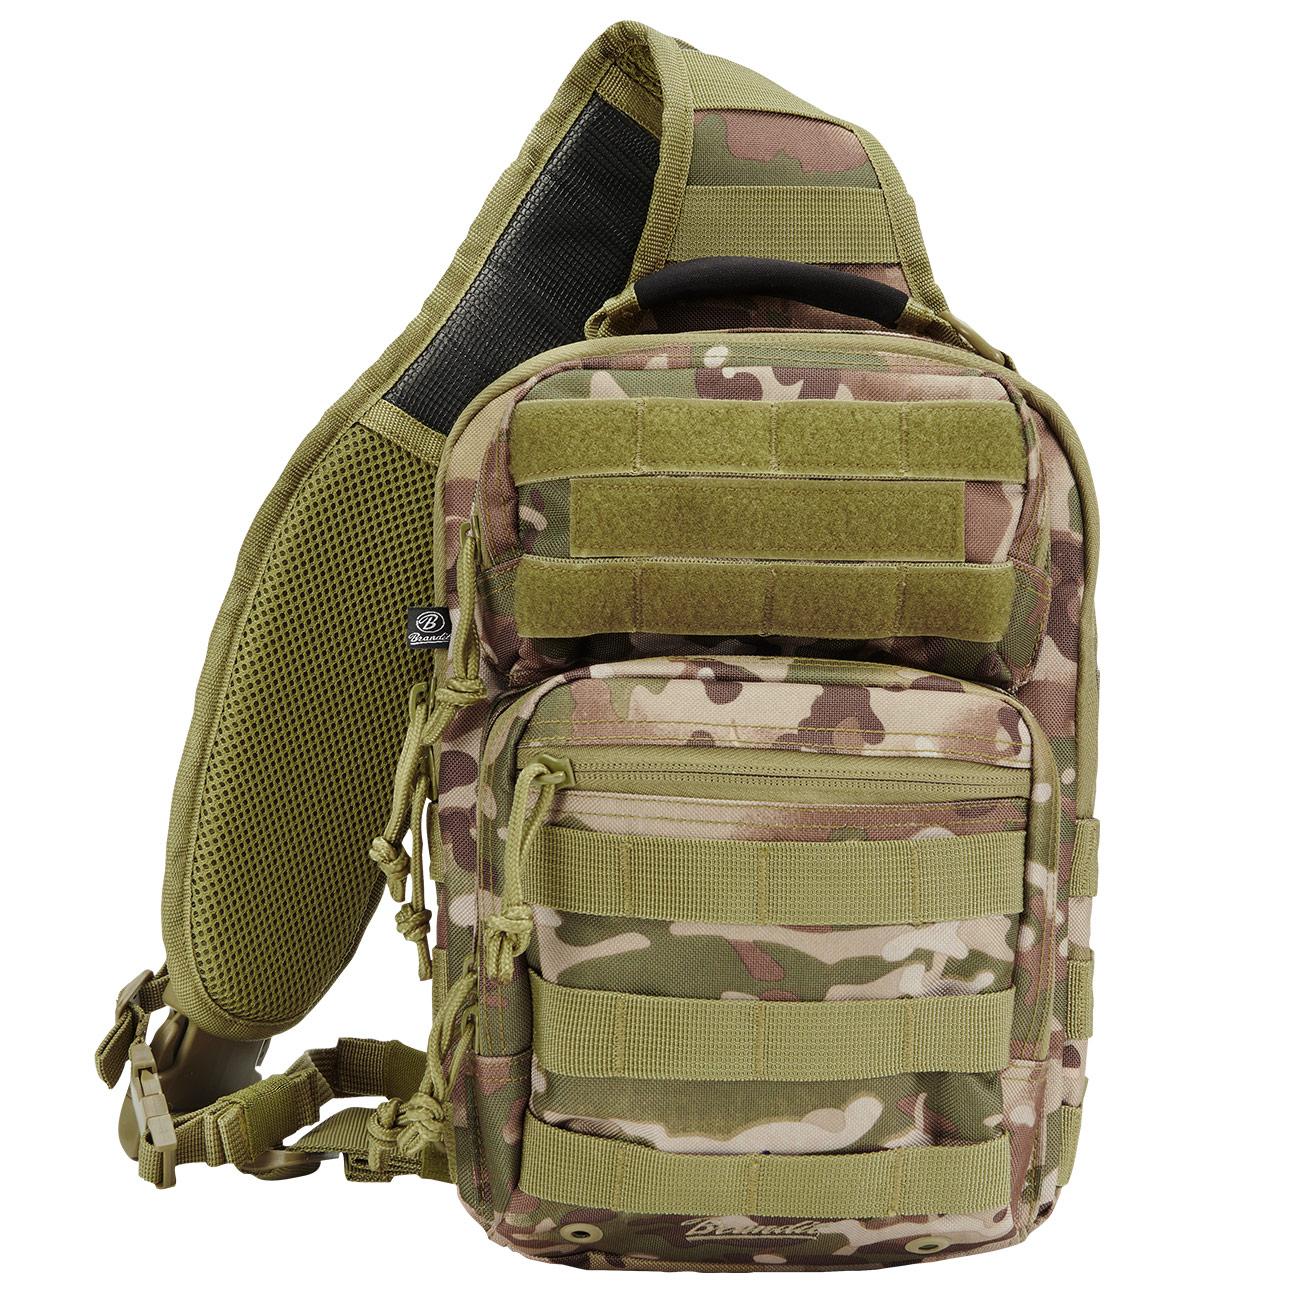 a9ae99572b367 Brandit Rucksack US Cooper EveryDayCarry-Sling 8 Liter tactical camo ...